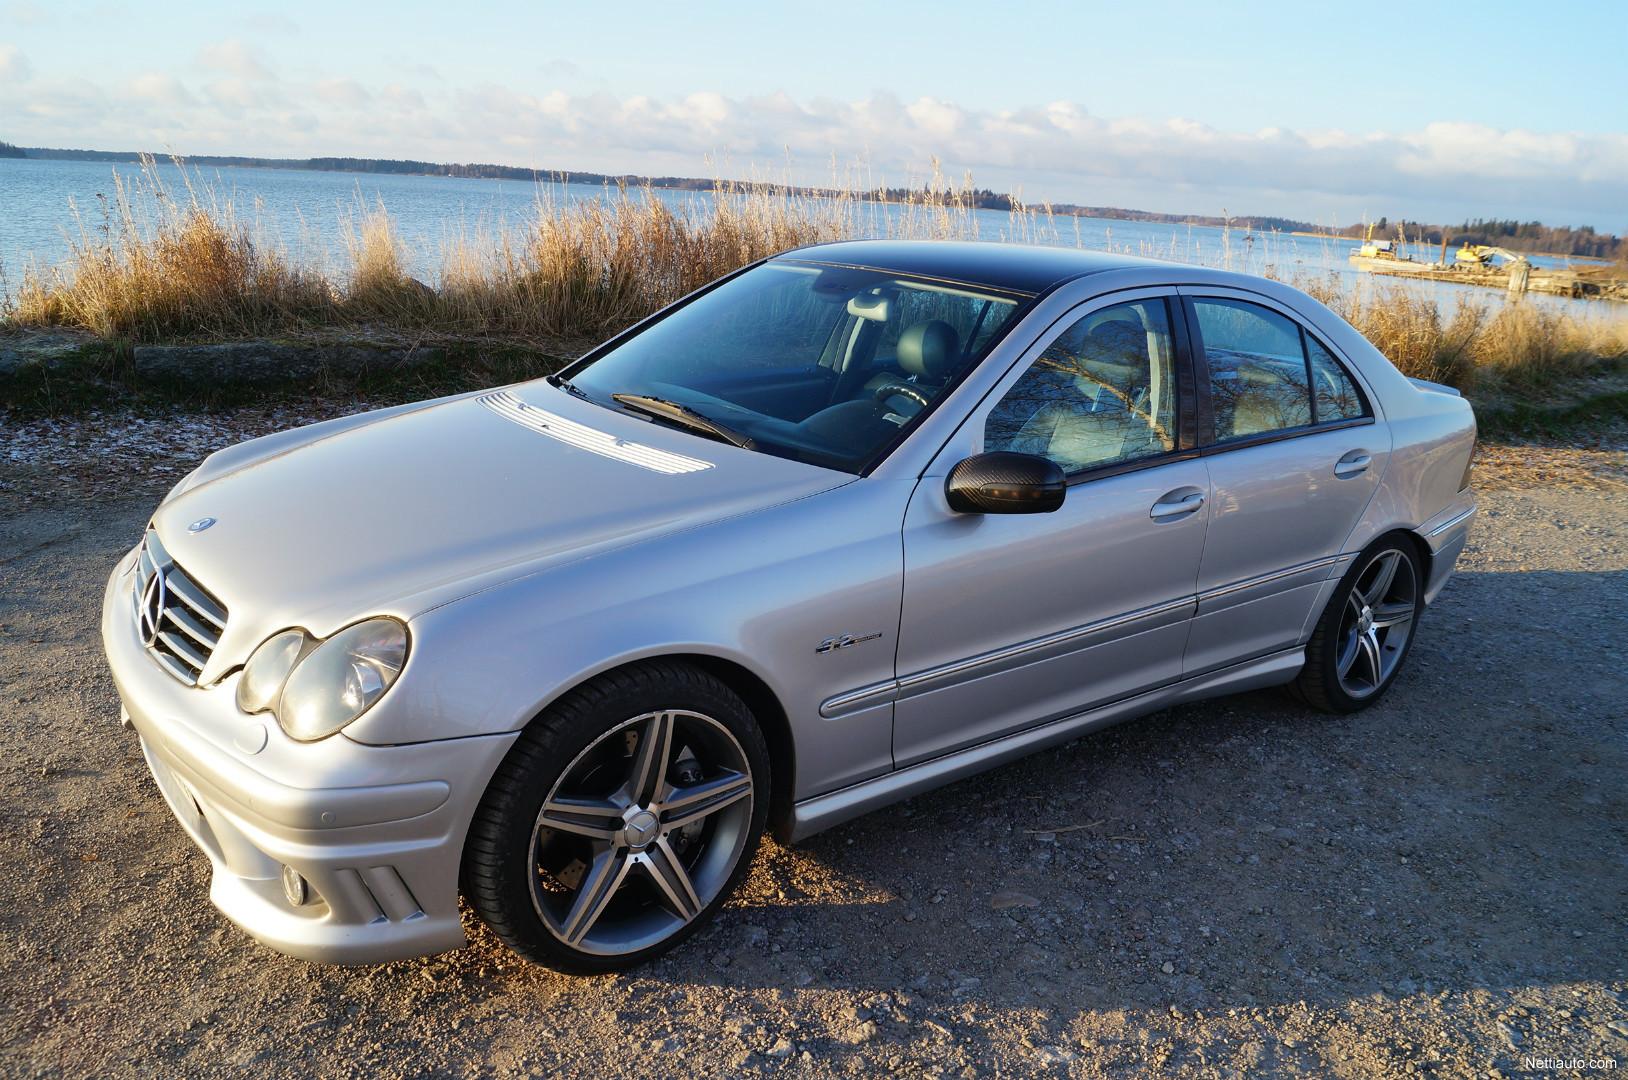 Mercedes Benz E32 Amg Sorgusuna Uygun Resimleri Bedava Indir